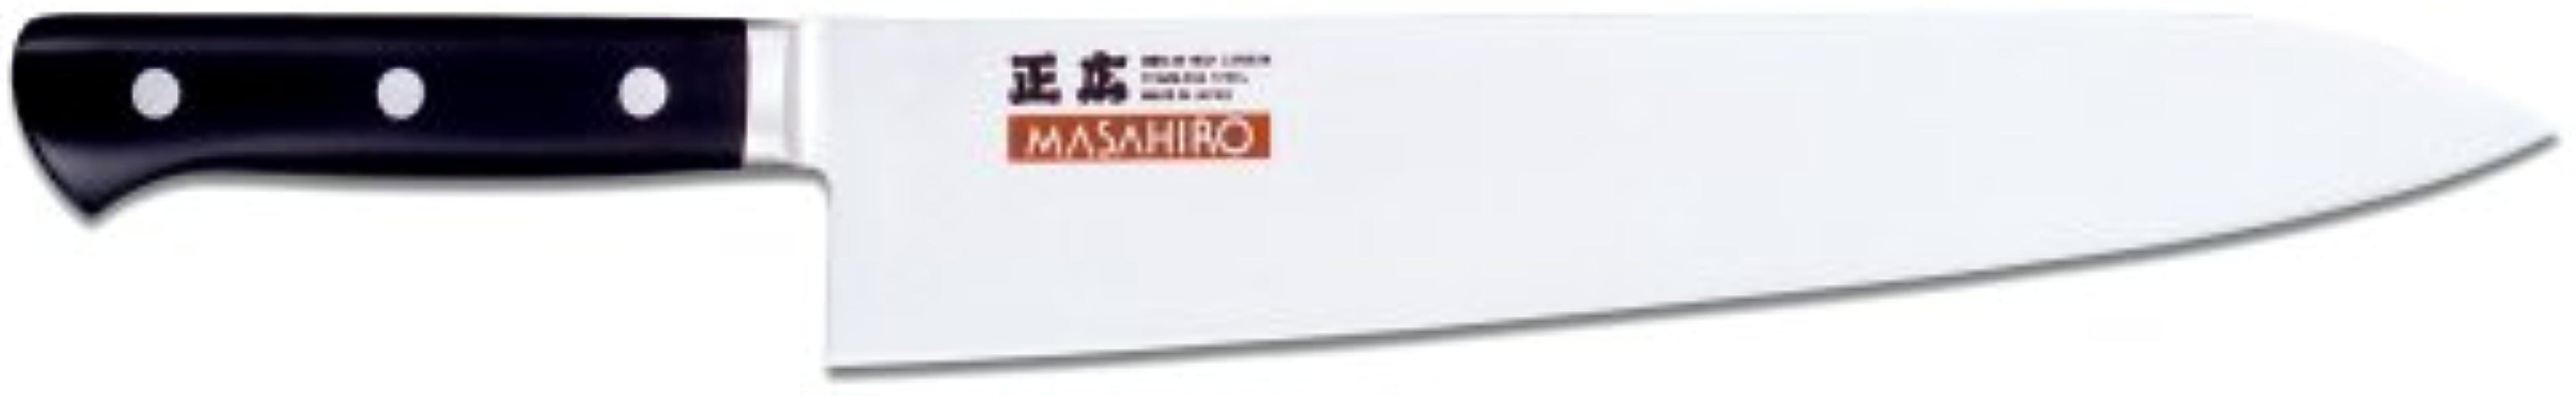 Masahiro 14914 MVH 12 Inch Chef S Knife